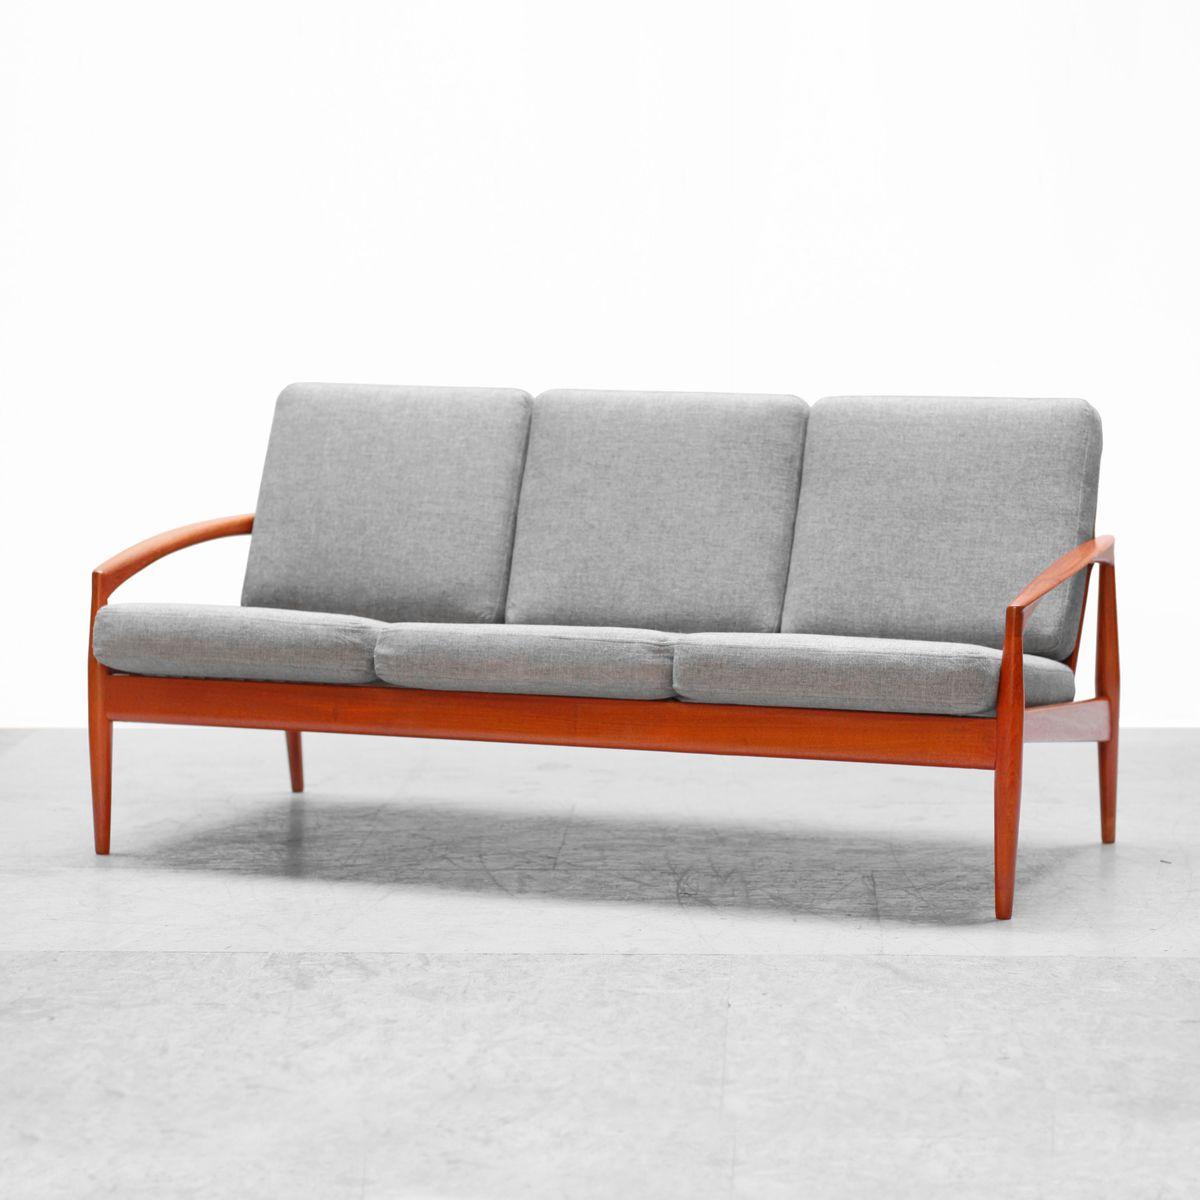 Danish Teak Sofa By Kai Kristiansen For Magnus Olesen 1950s